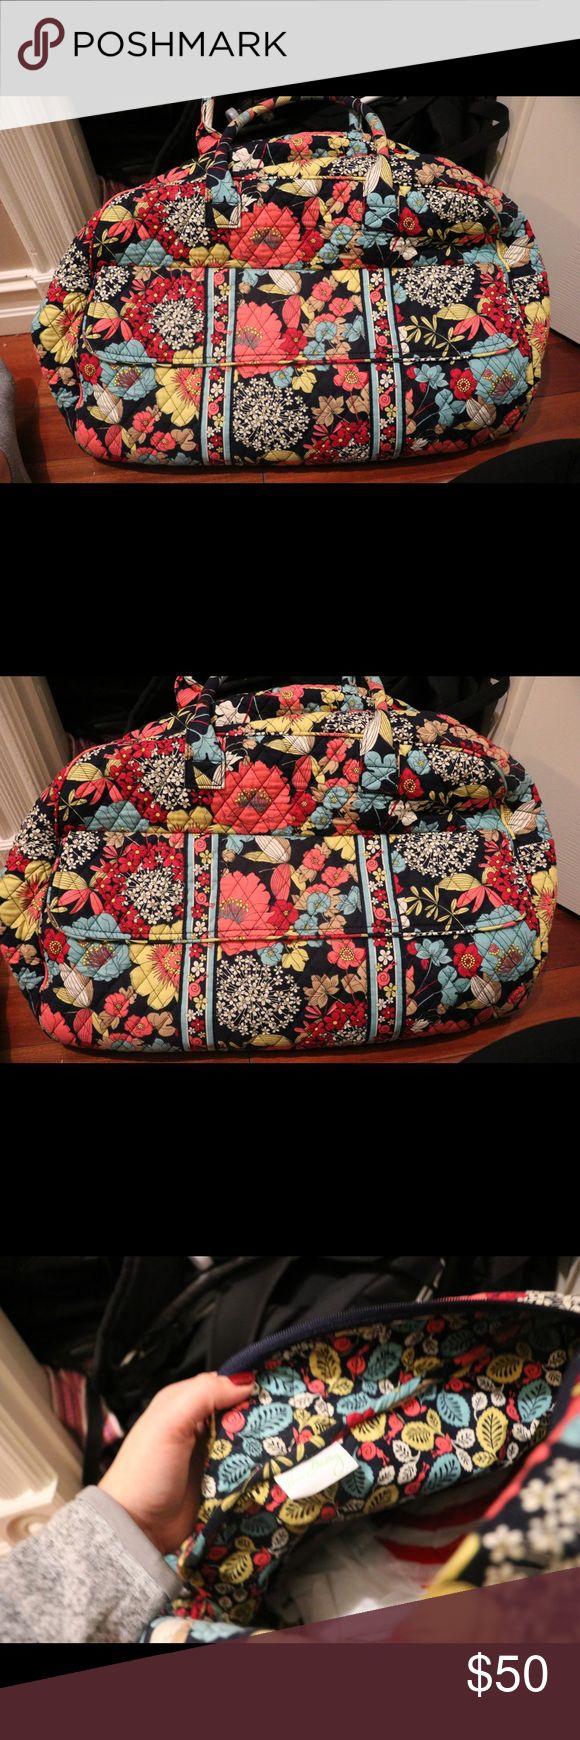 Vera Bradley Duffel Super cute & in great condition! Vera Bradley Bags Travel Bags